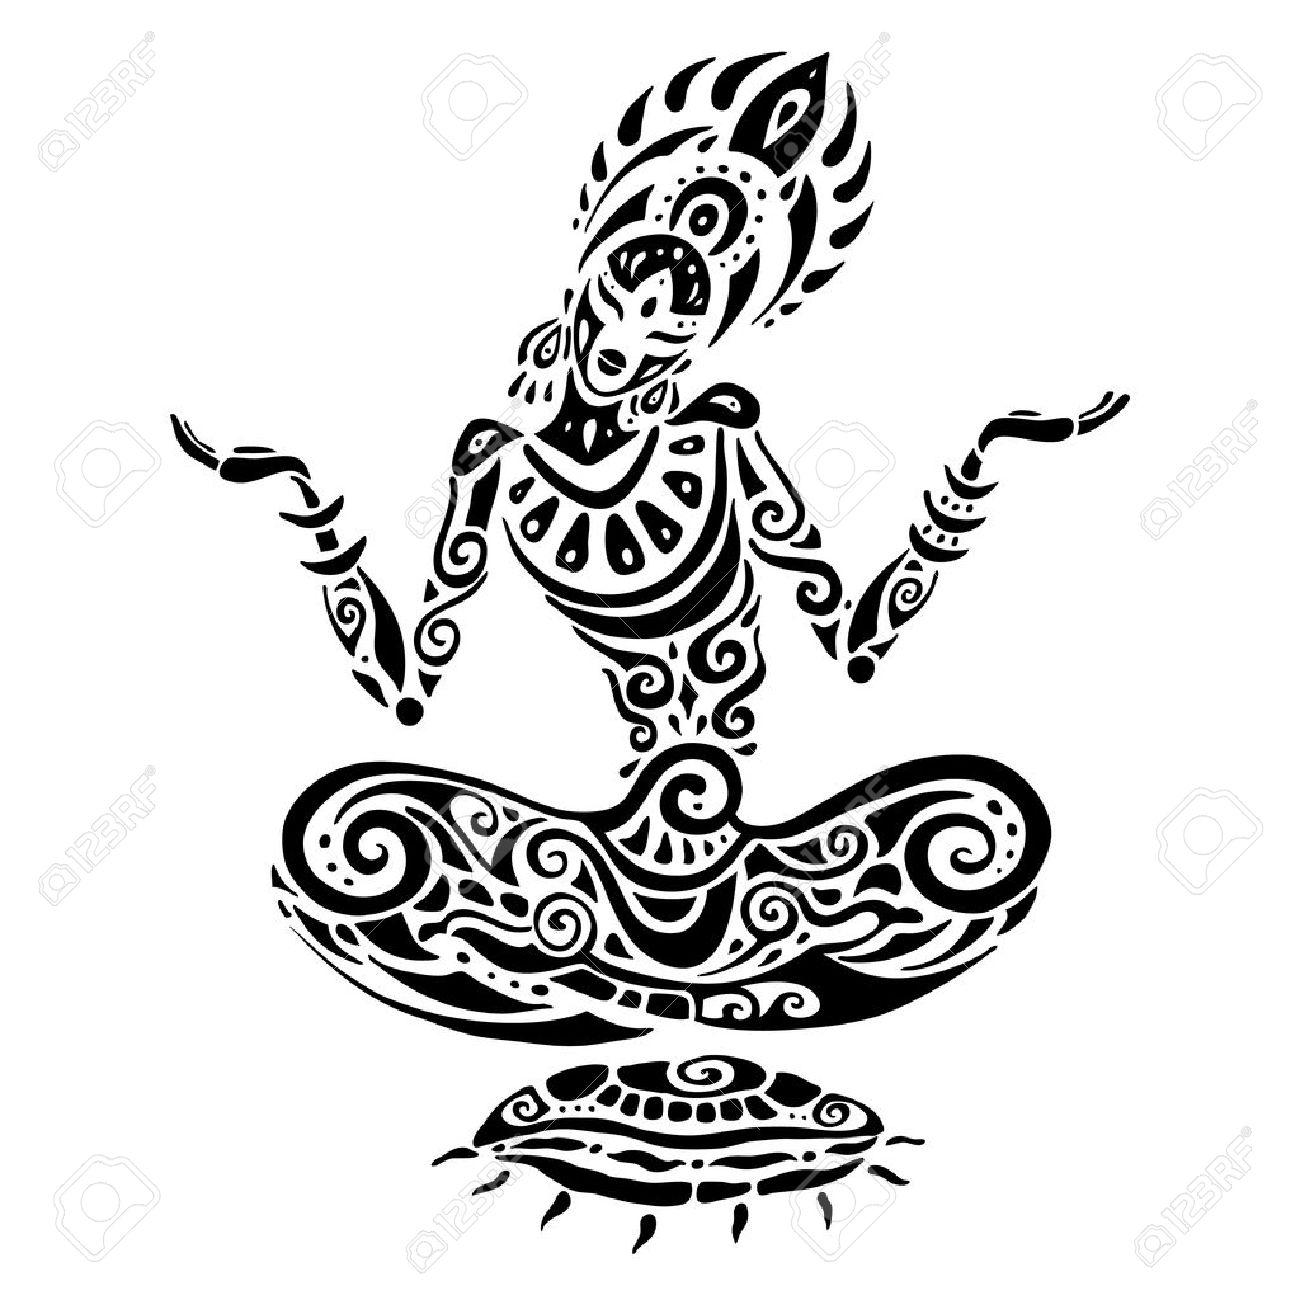 Yoga Meditation Lotus Pose Hand Drawn Illustration Tatouage De